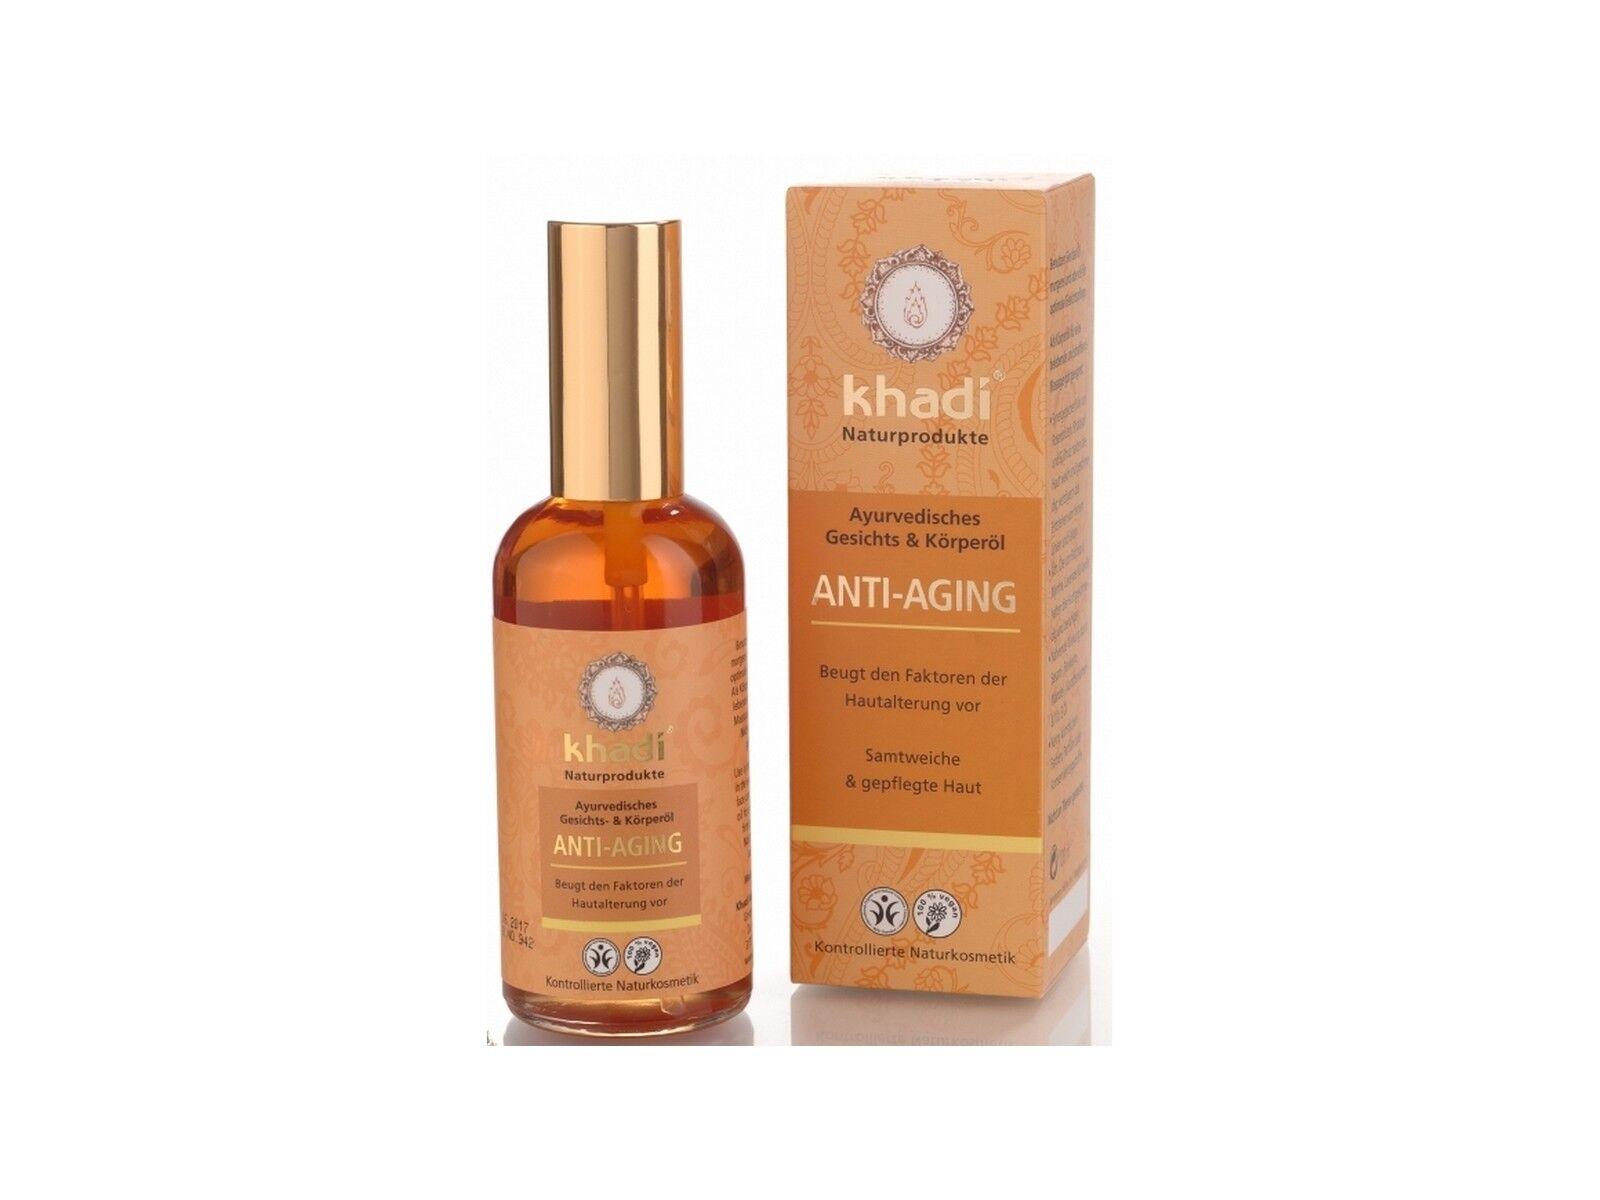 (13,99€/100ml) Khadi Anti Aging 100ml Gesichtsöl und Körperöl